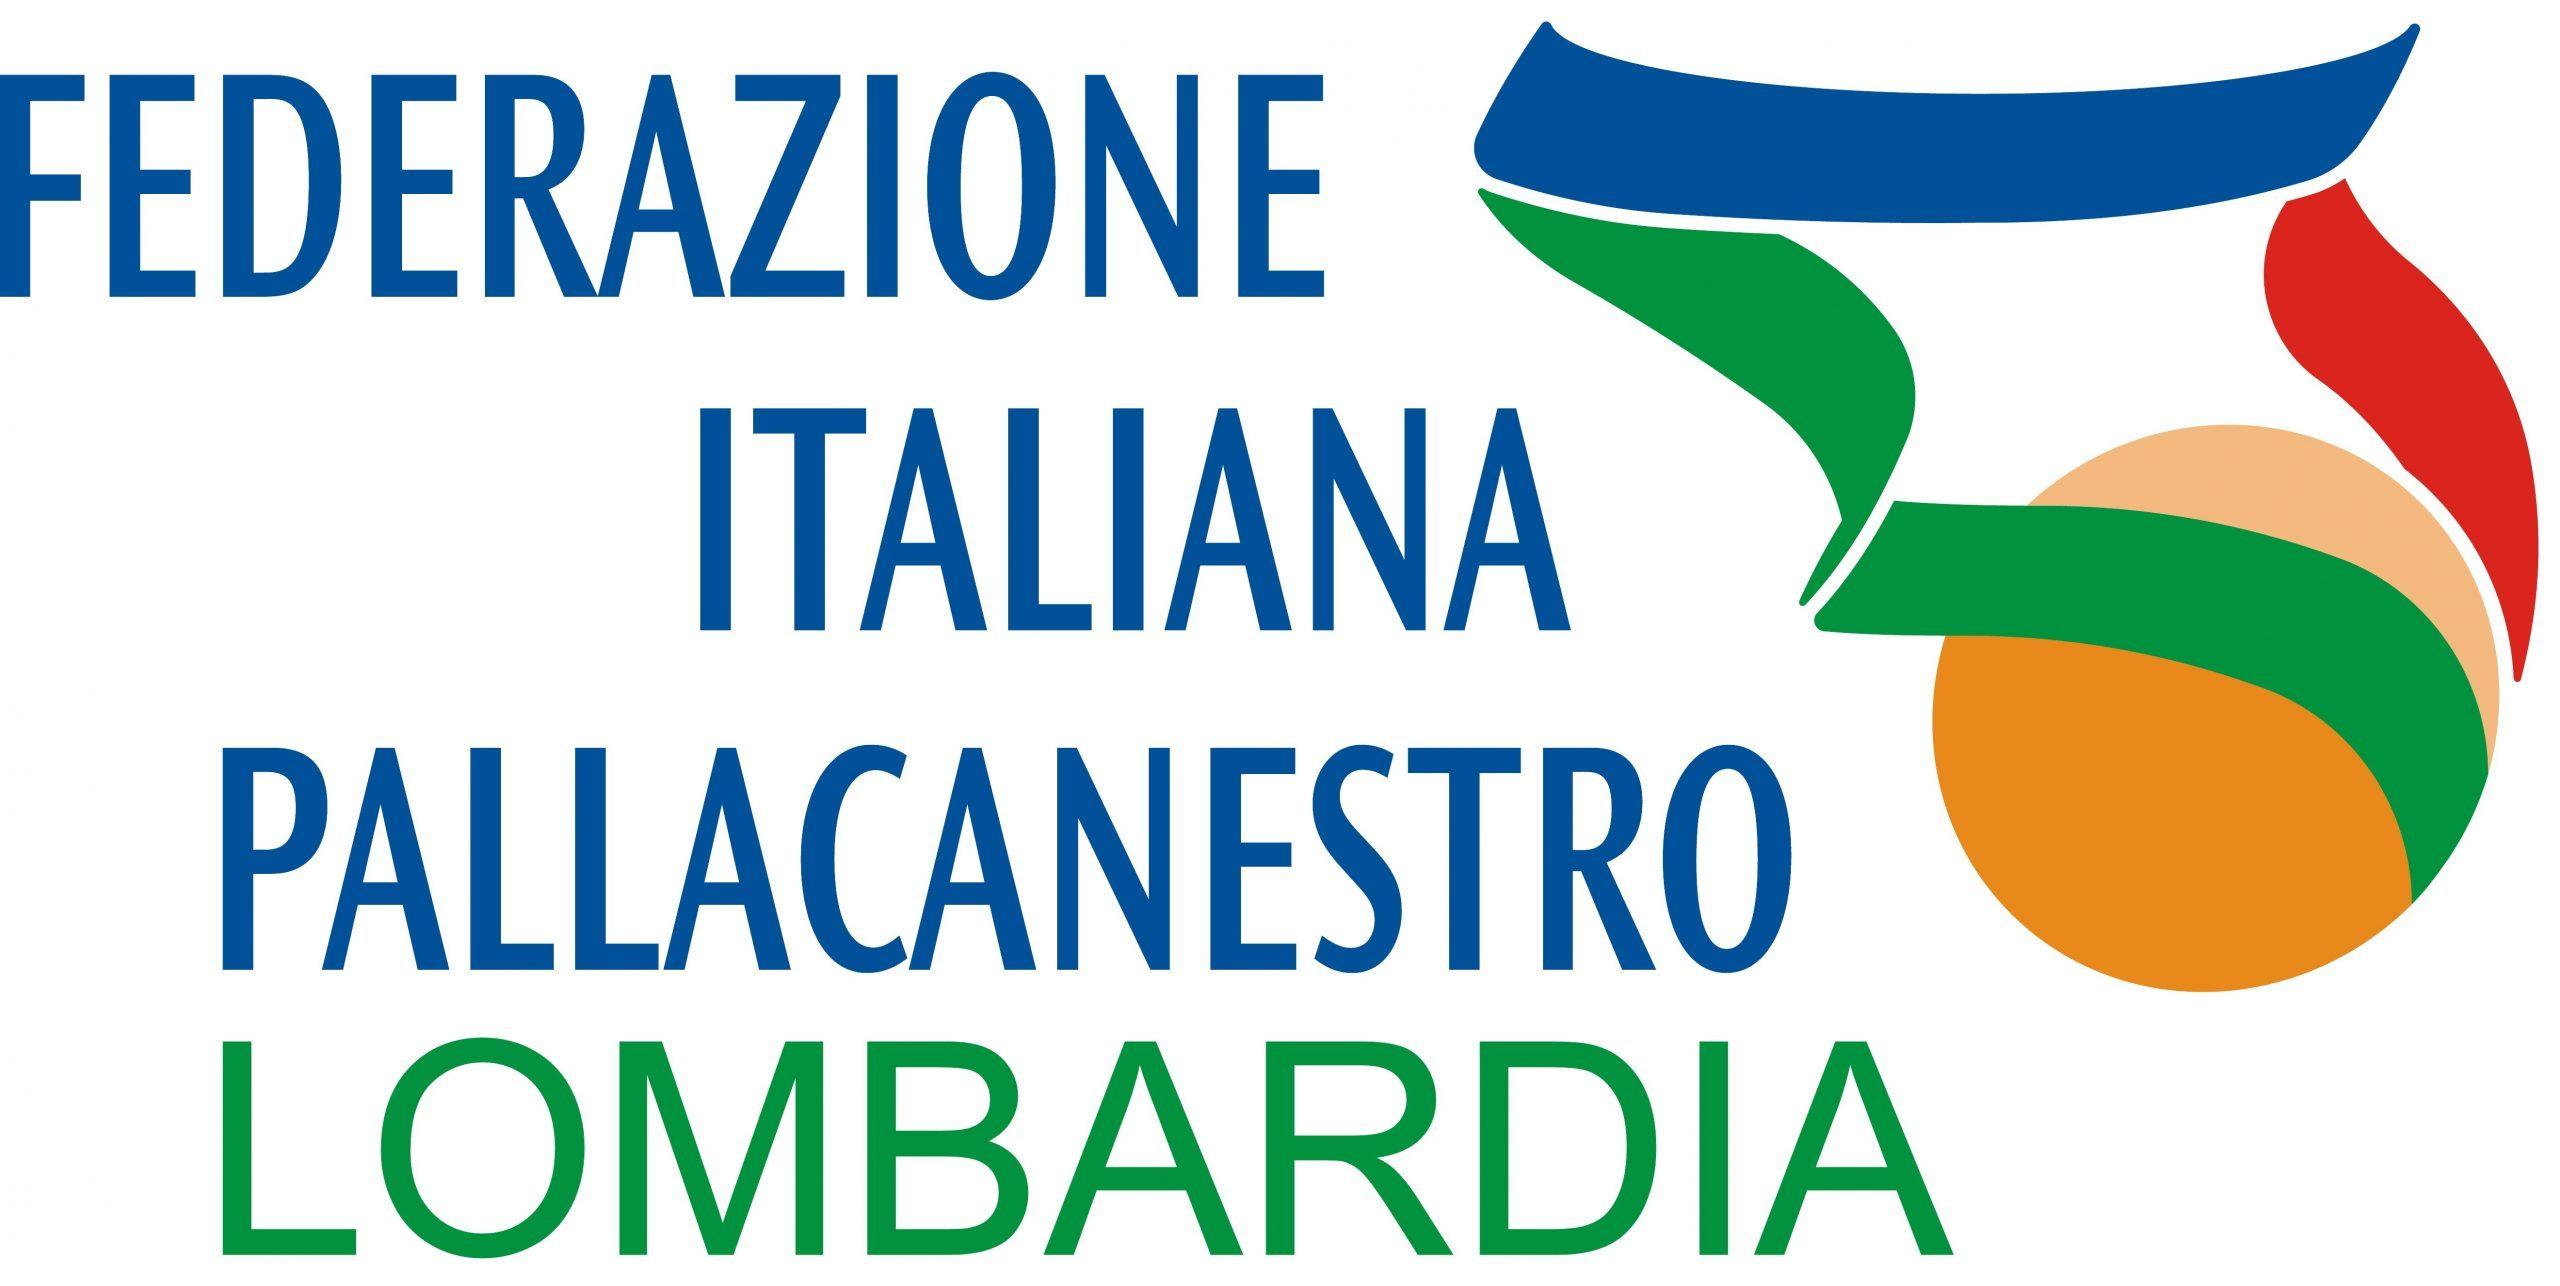 Lombardia Basket SocialOsa